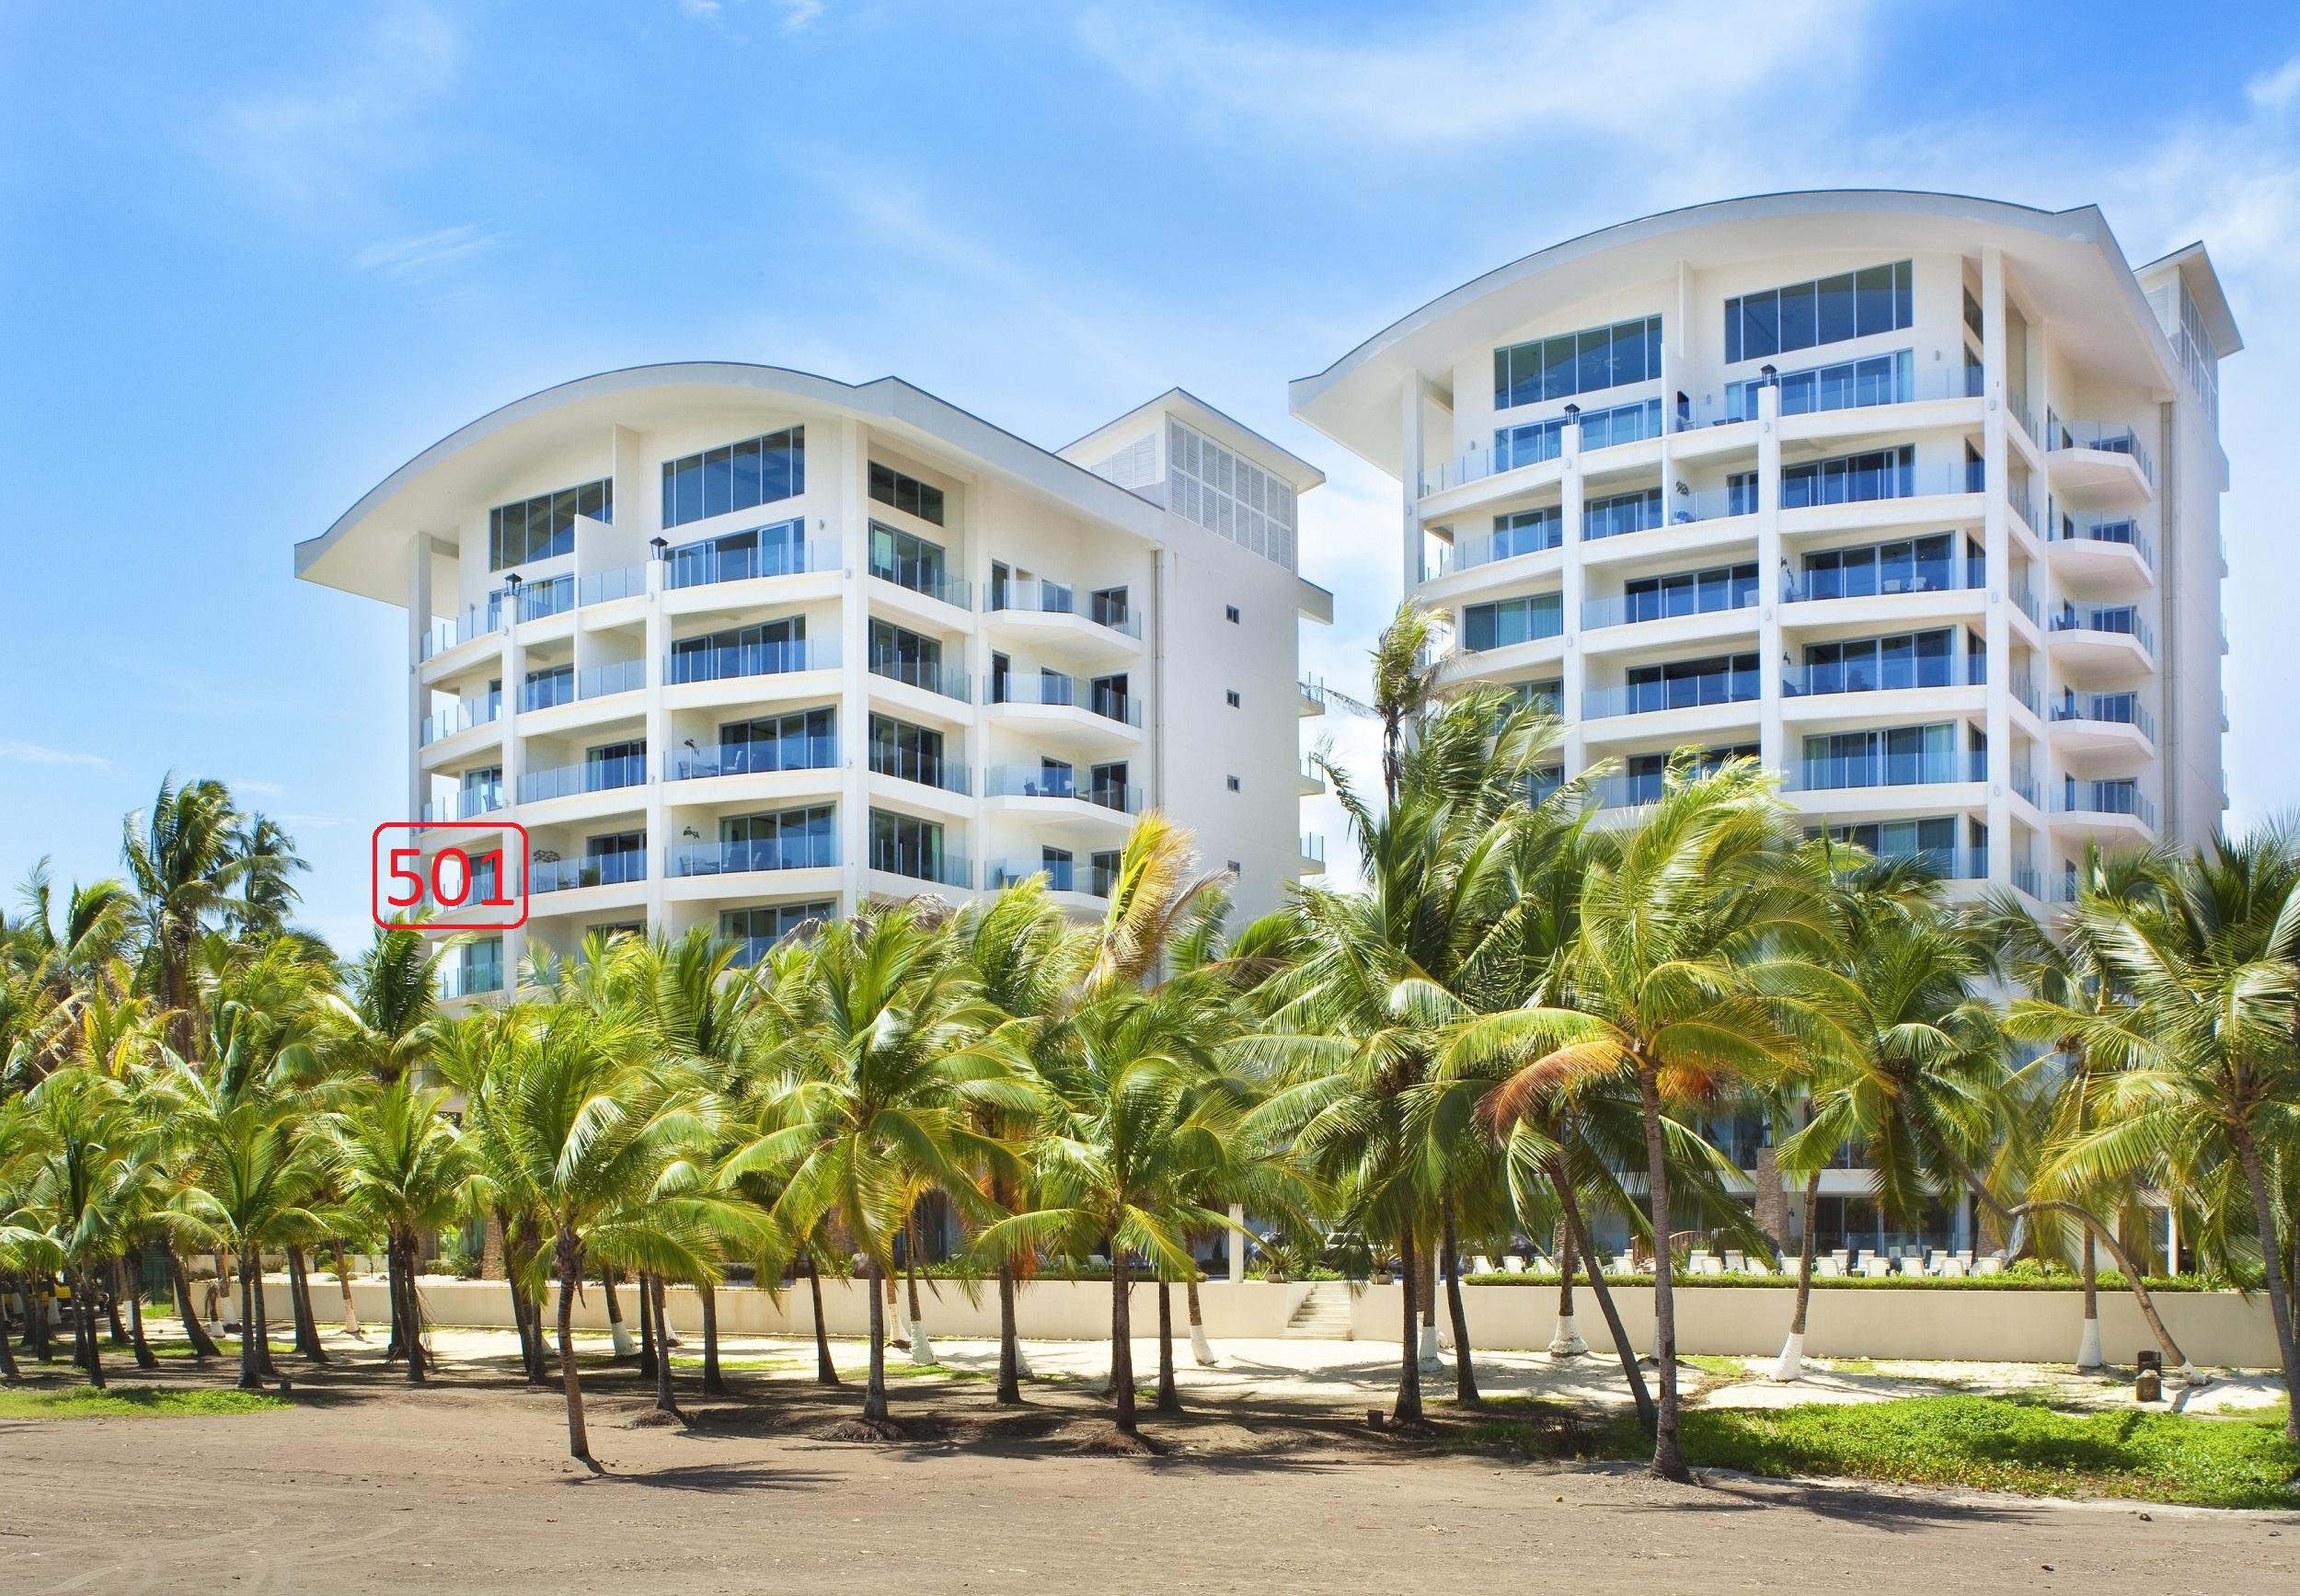 JACO-Costa-Rica-property-costaricarealestateJAC020-3.jpg